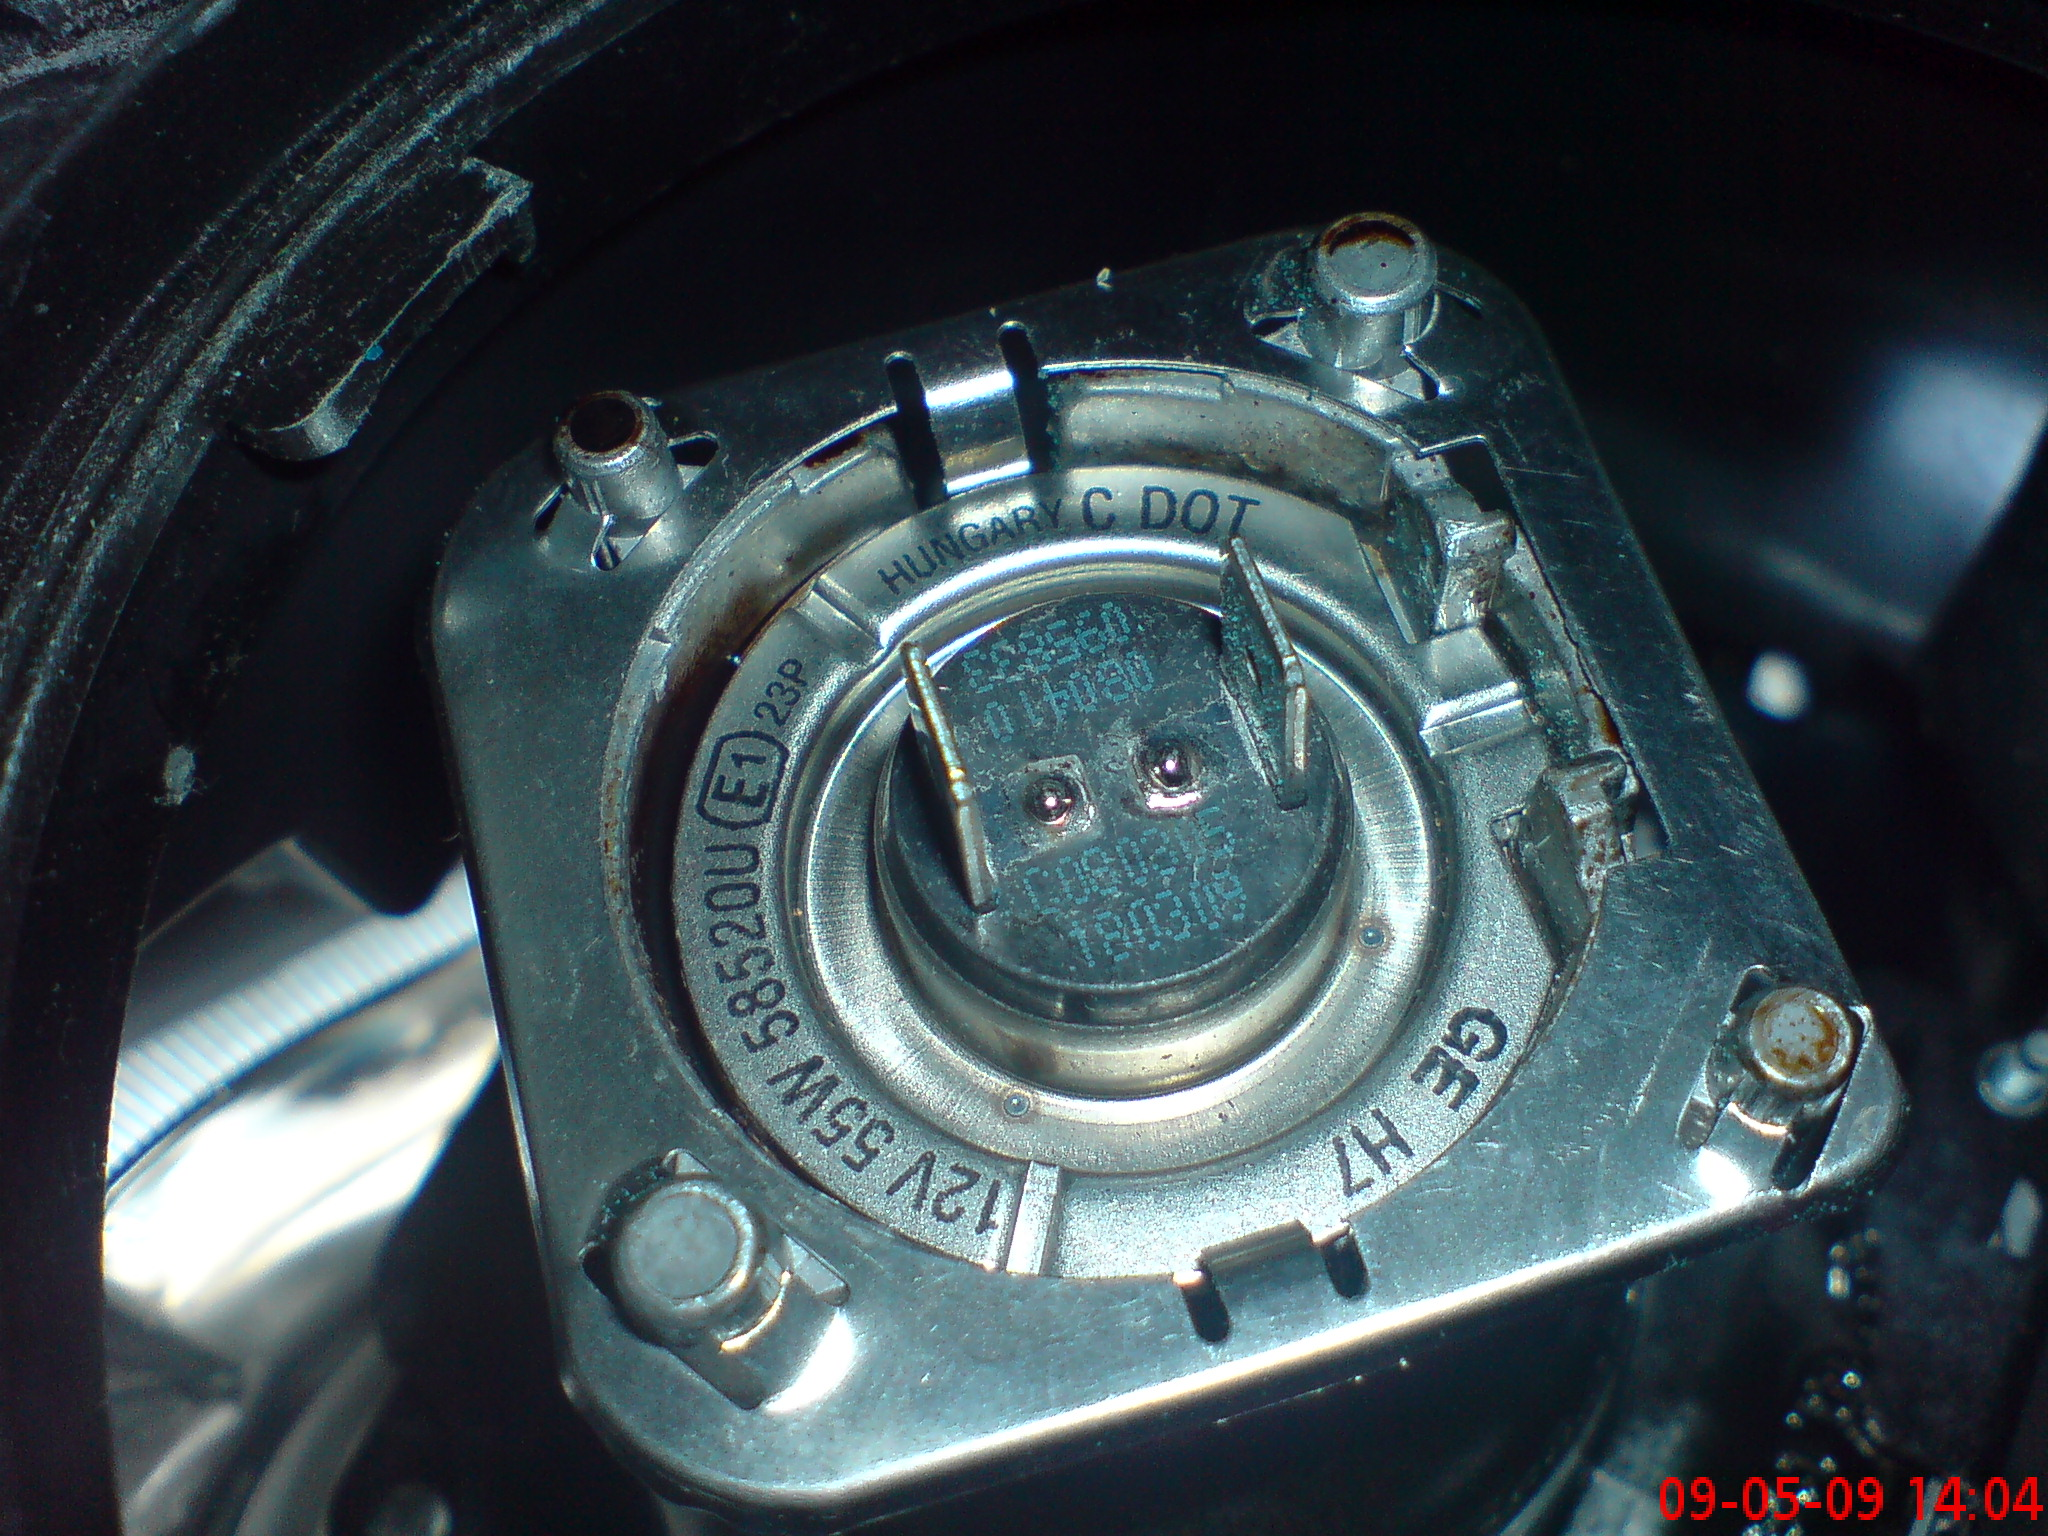 Megane Ii Phii Slabe Swiatla Mijania Megane Ii Ph Ii 1 5dc Elektr Ogolne Megane Ii Scenic Ii Forum Renault Megane Scenic Fluence